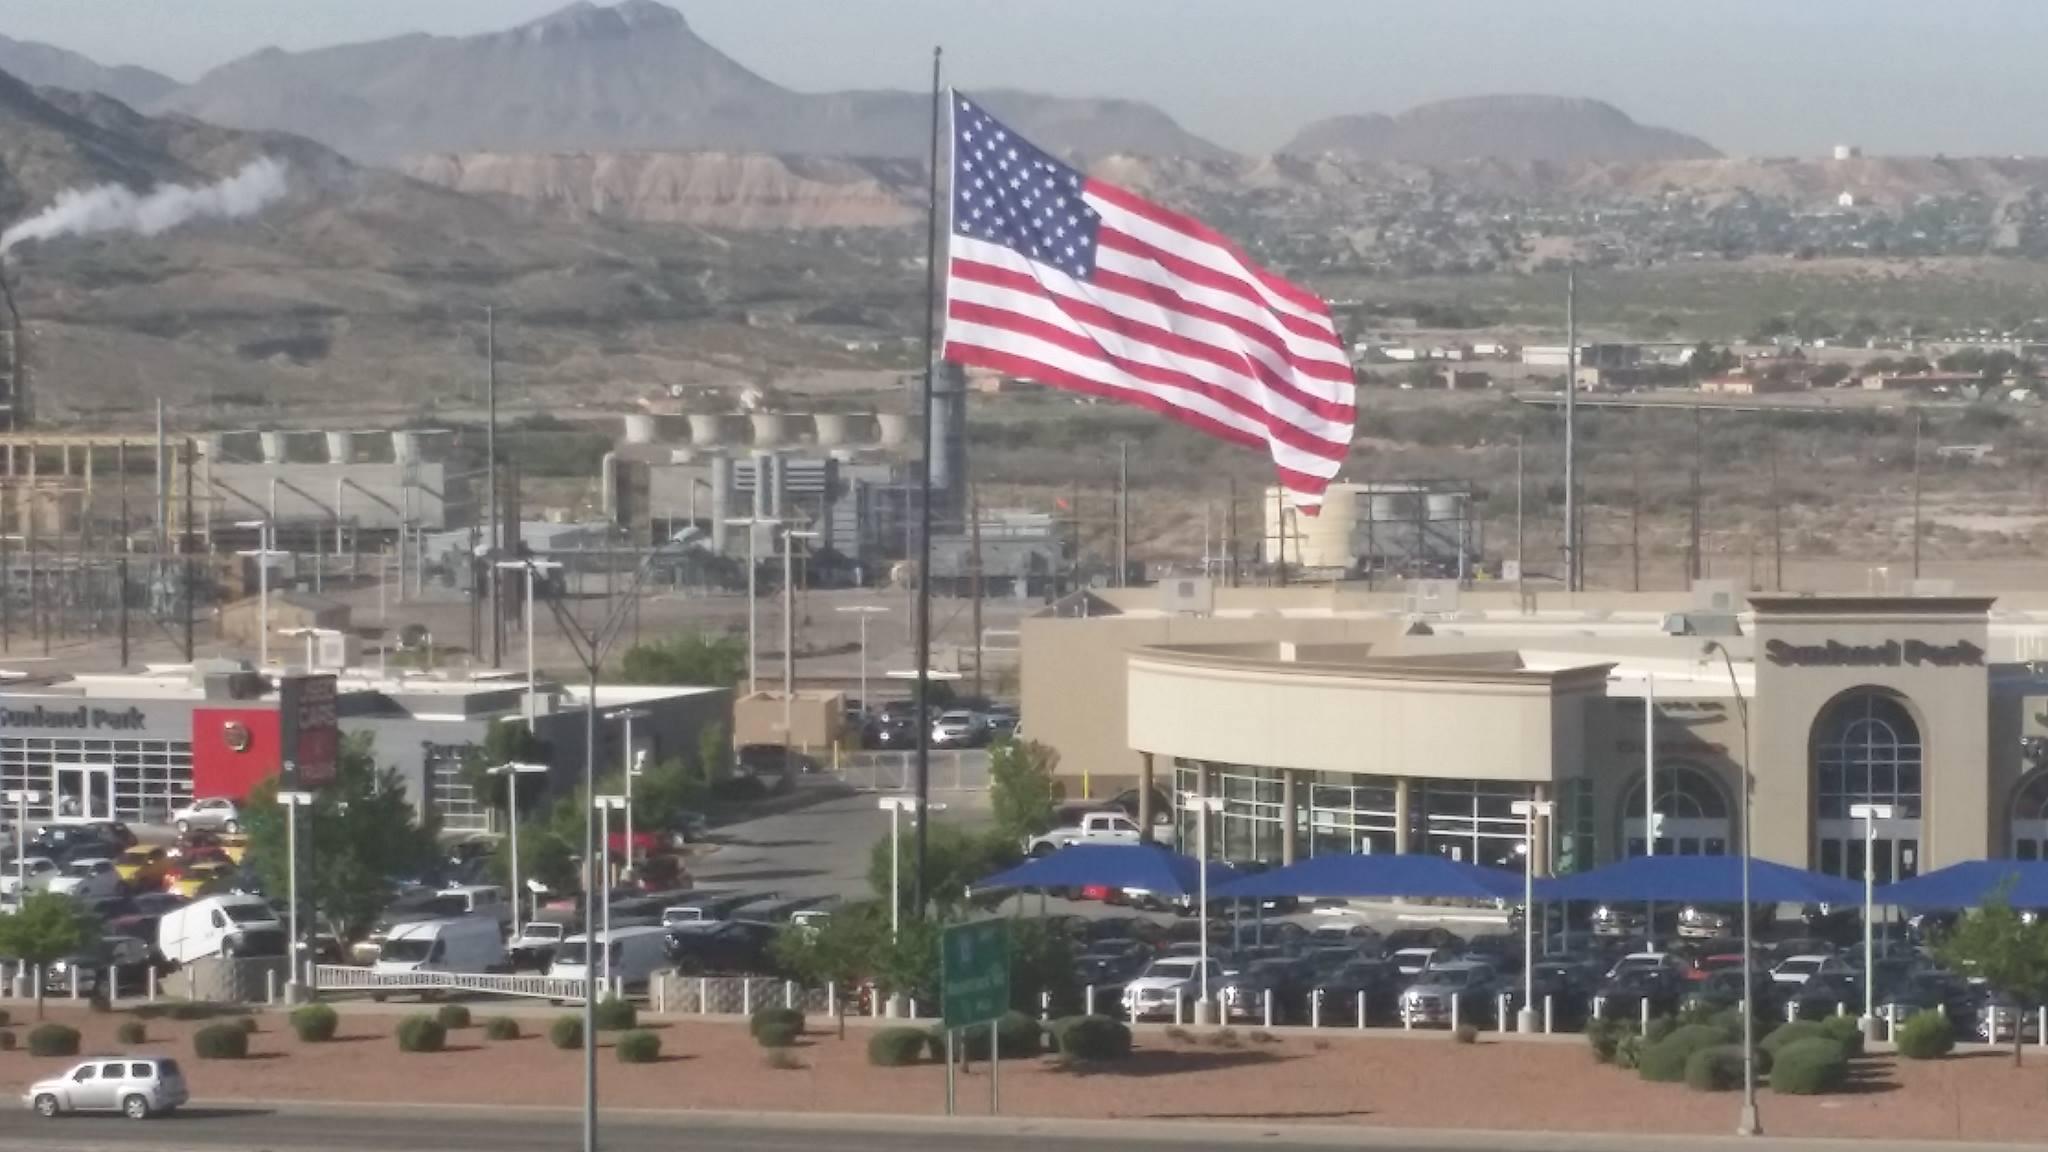 Sunland Park Dodge Chrysler Jeep Ram 950 Crockett St El Paso TX